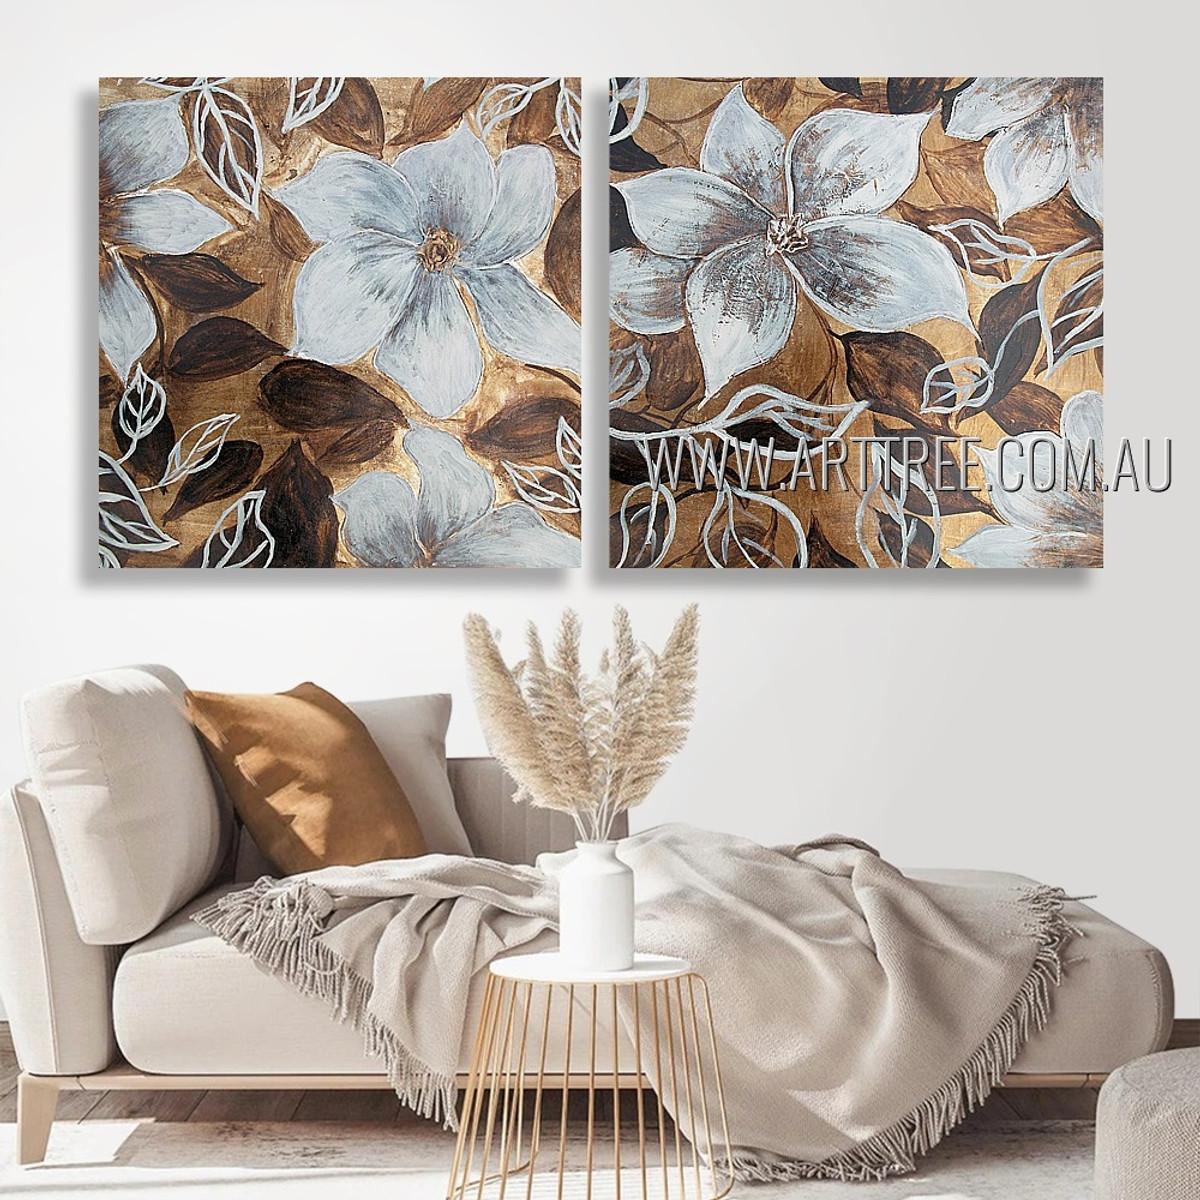 White Petal Blooms Floral Vintage Heavy Texture Artist Handmade 2 Piece Multi Panel Wall Art Paintings Set For Room Garnish